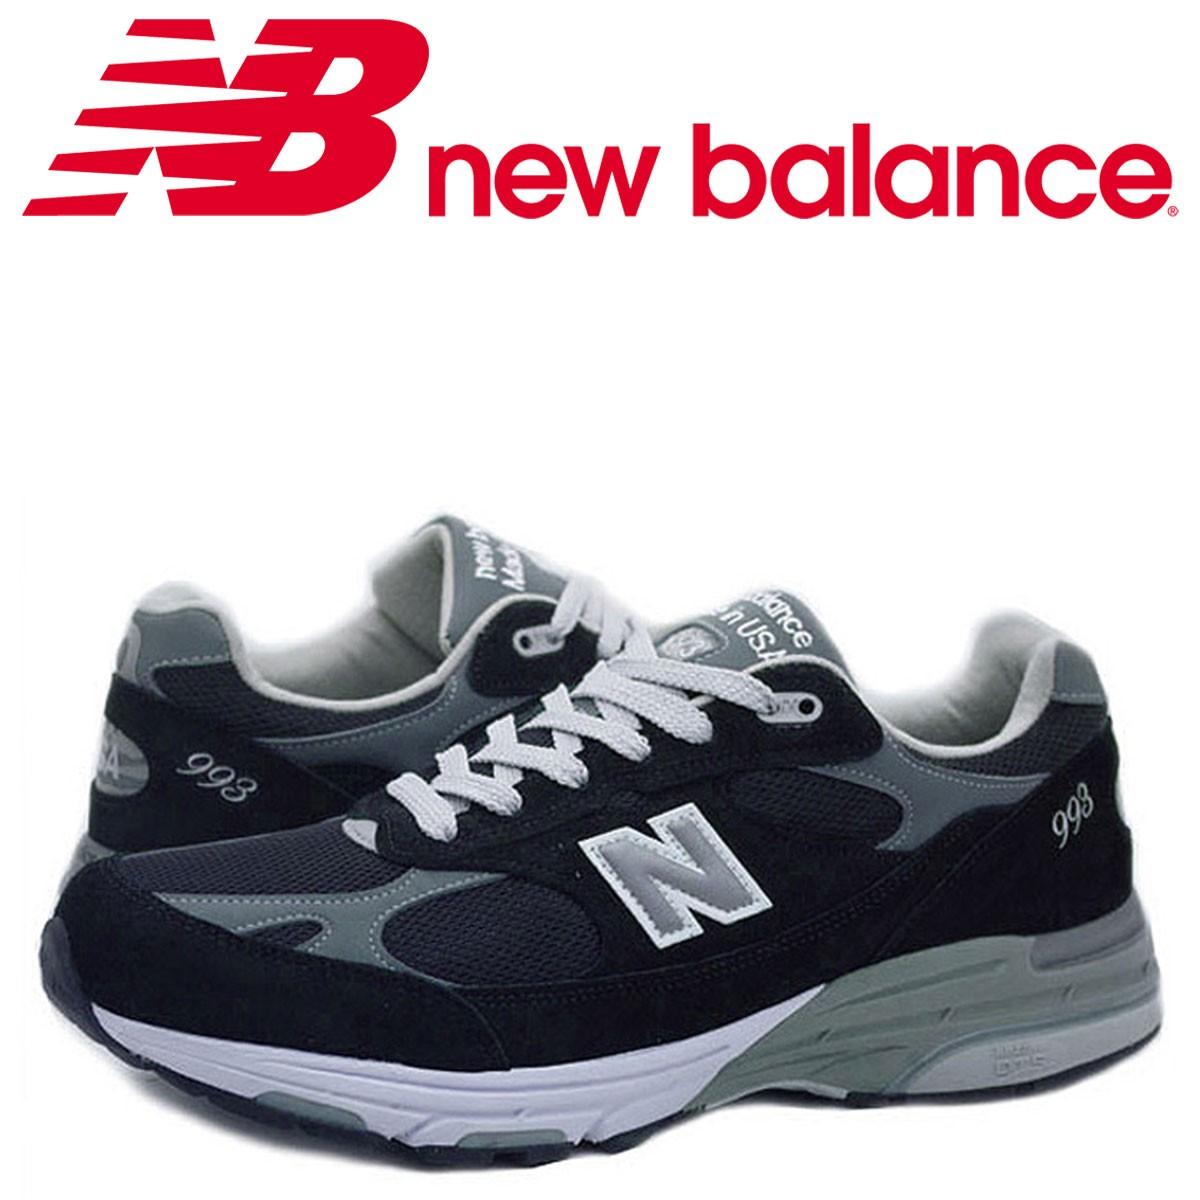 new balance MR993BK MADE IN USA ニューバランス メンズ スニーカー Dワイズ ブラック [3/15 再入荷] [182]